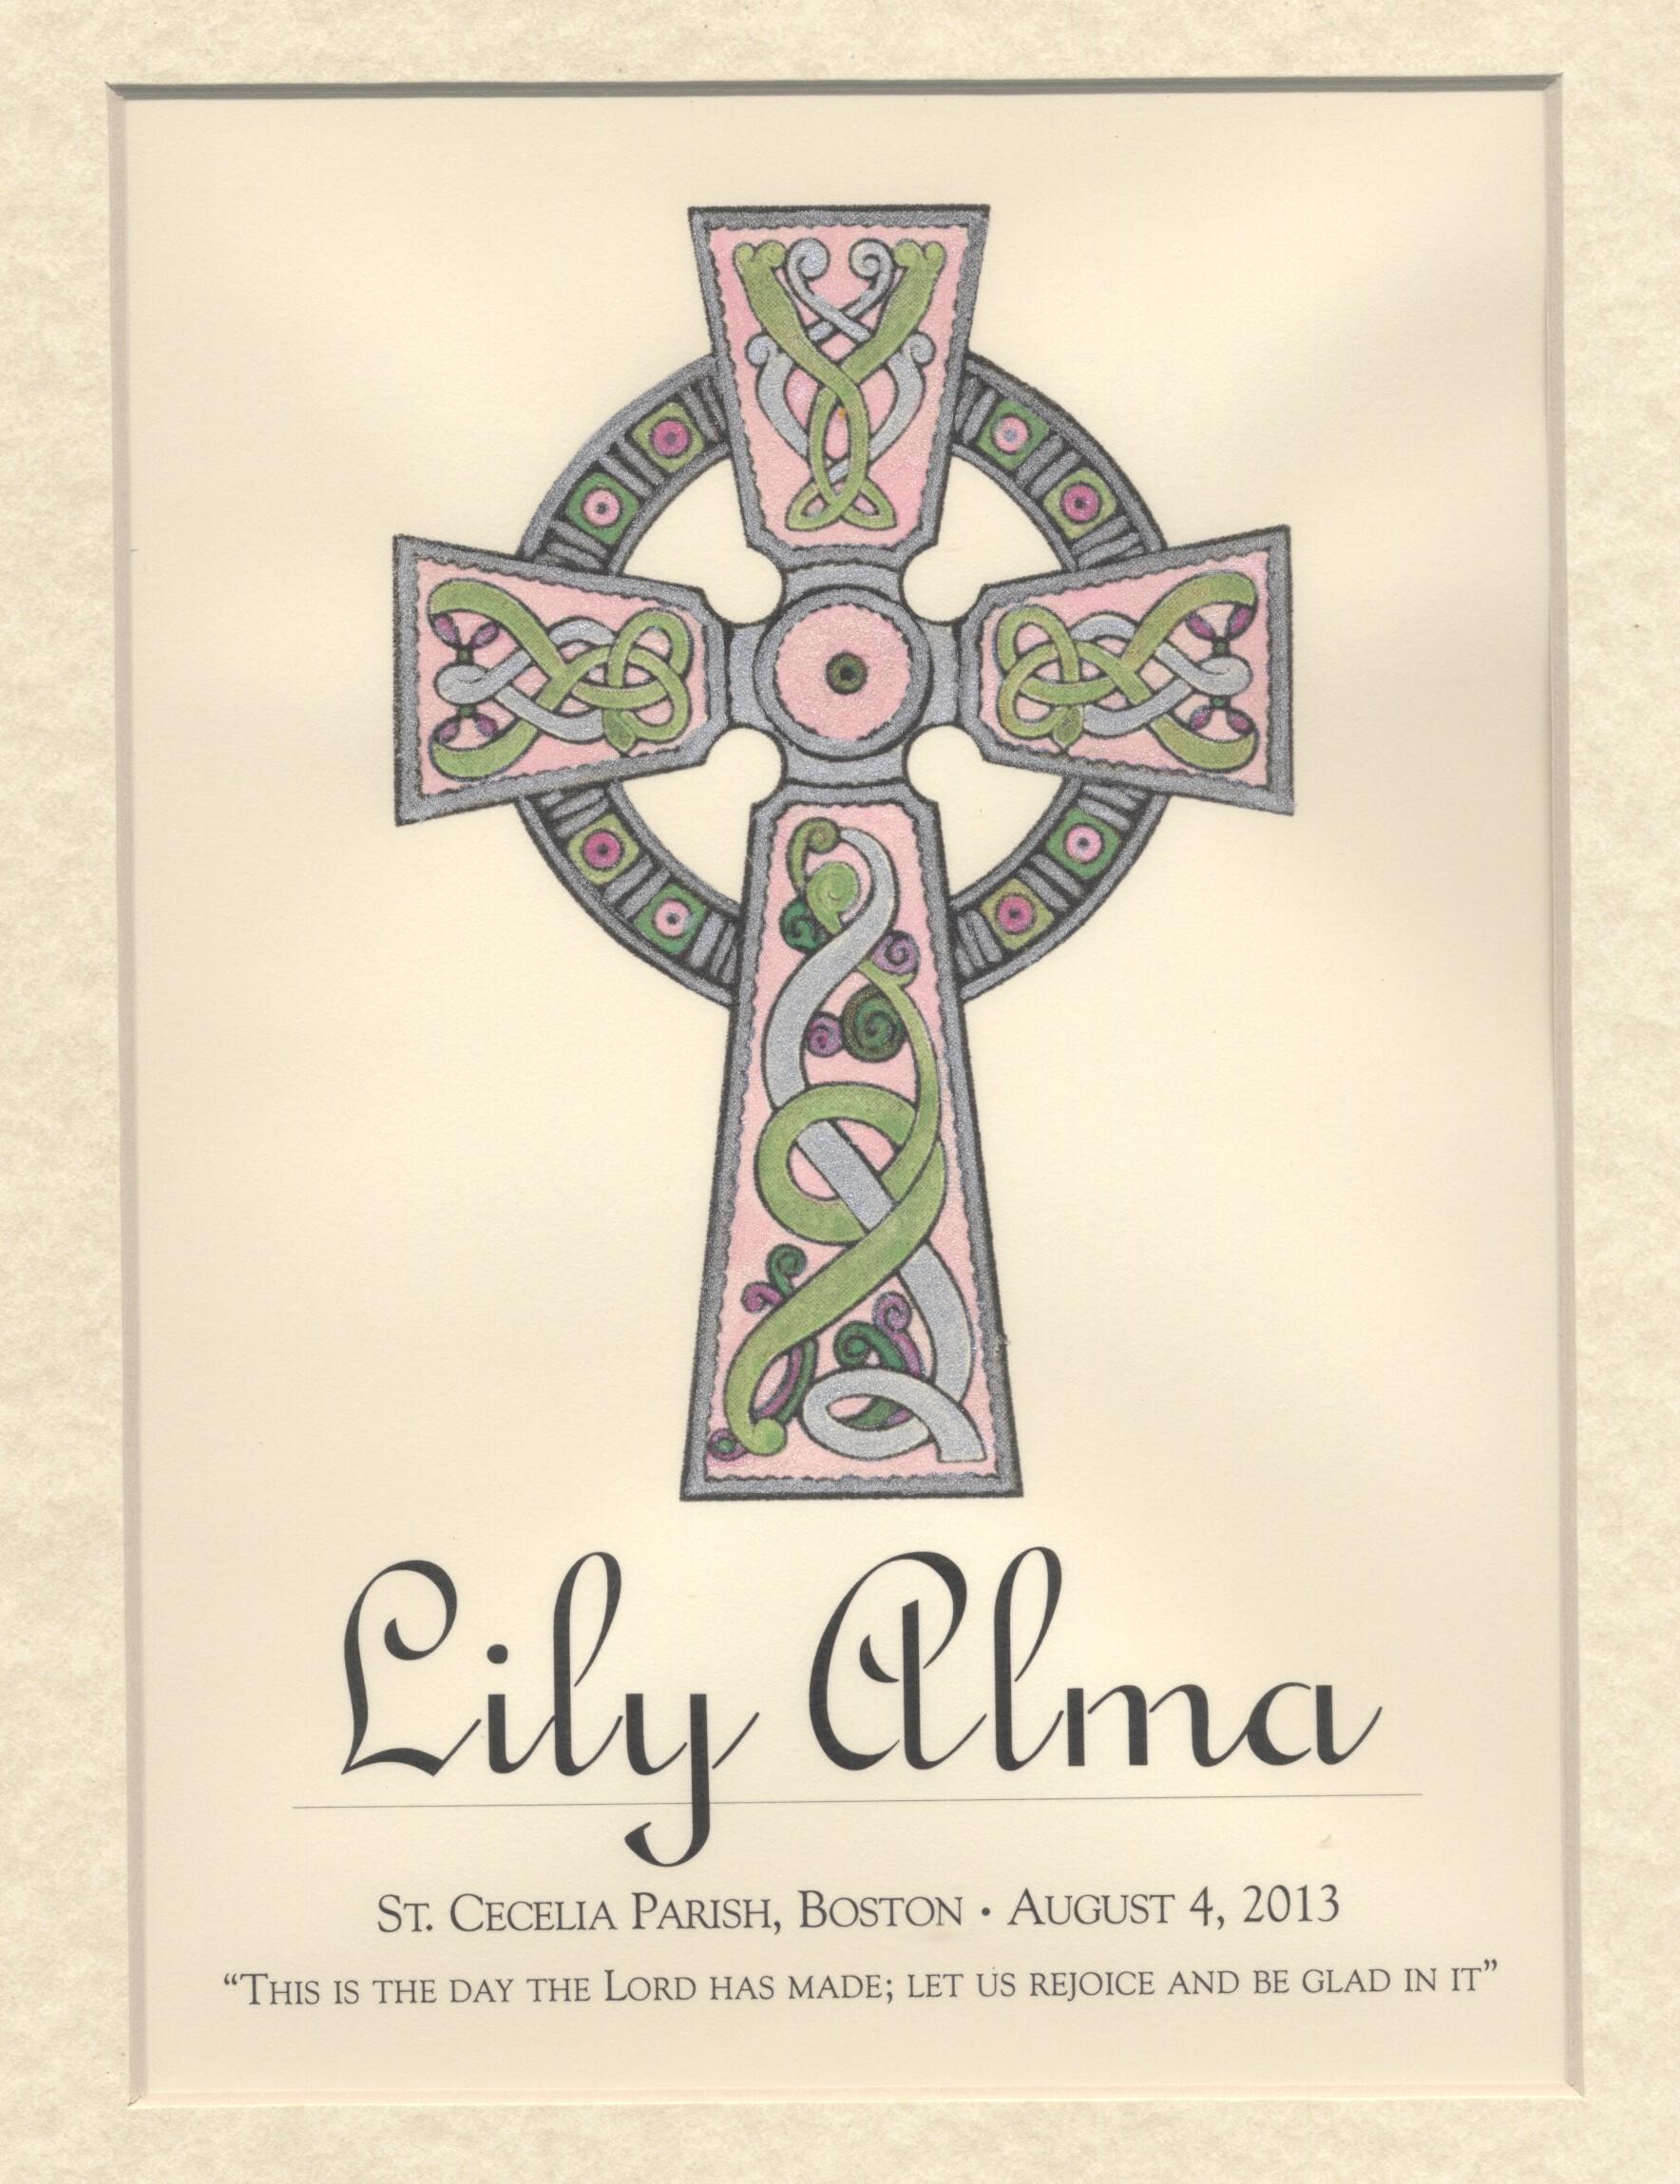 CelticCross.LilyAlma.jpg